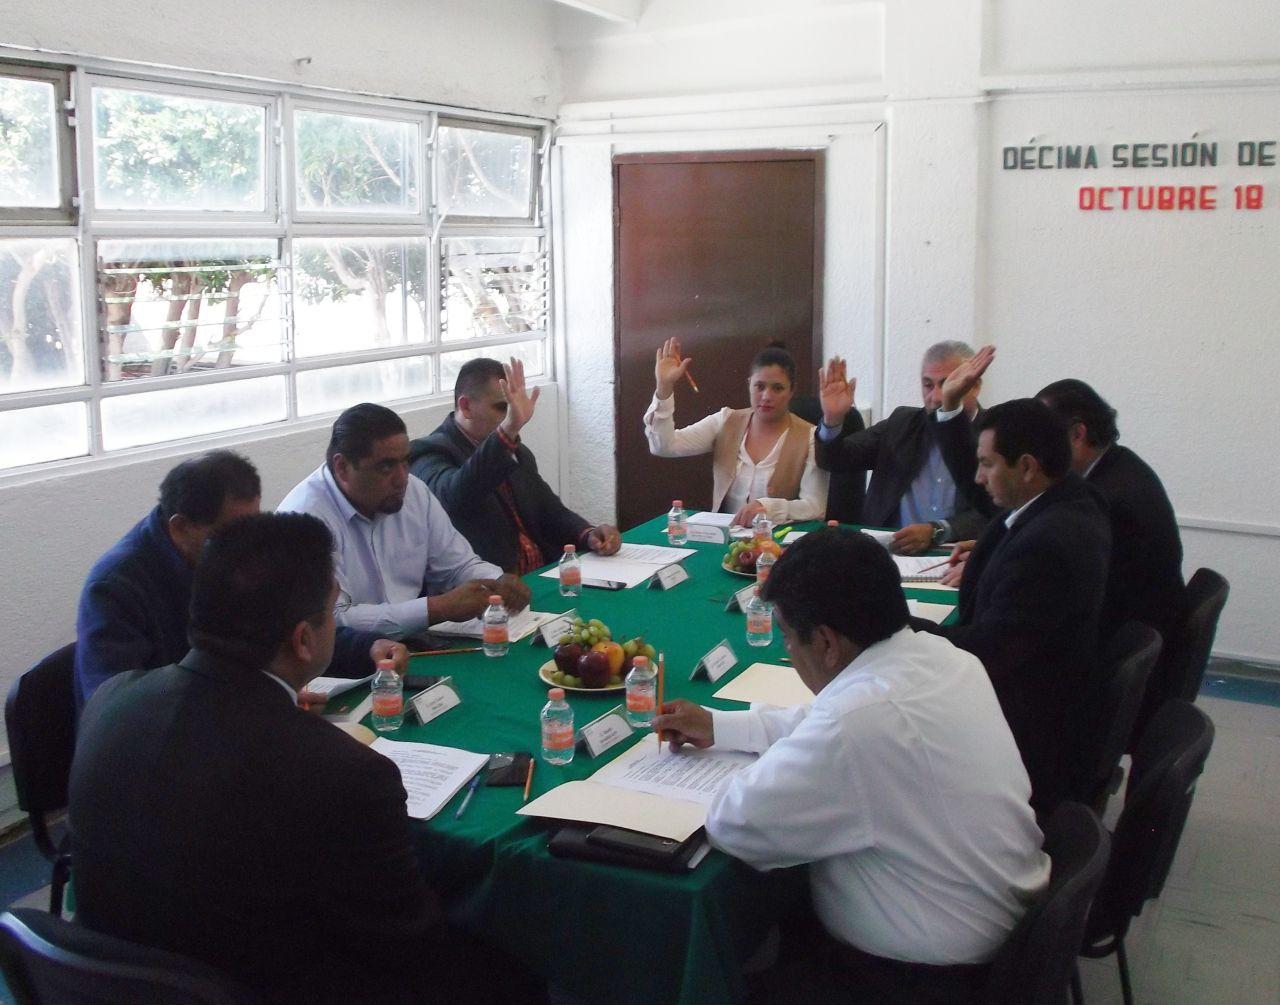 Fernanda de la Rosa: Importante revisar socavones y fugas de agua en Ecatepec